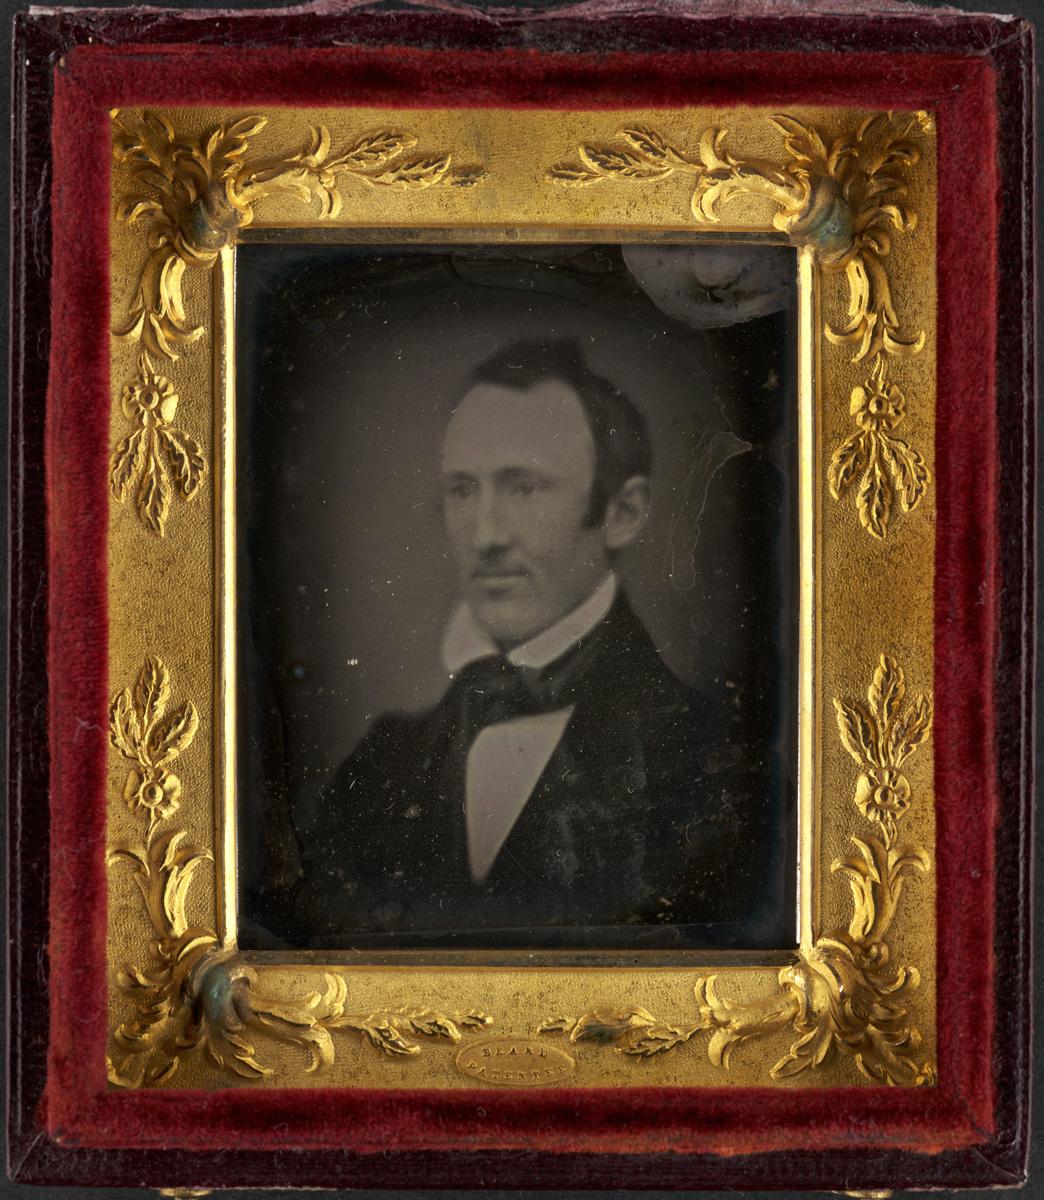 Image of Richard Beard Sr. from Wikidata